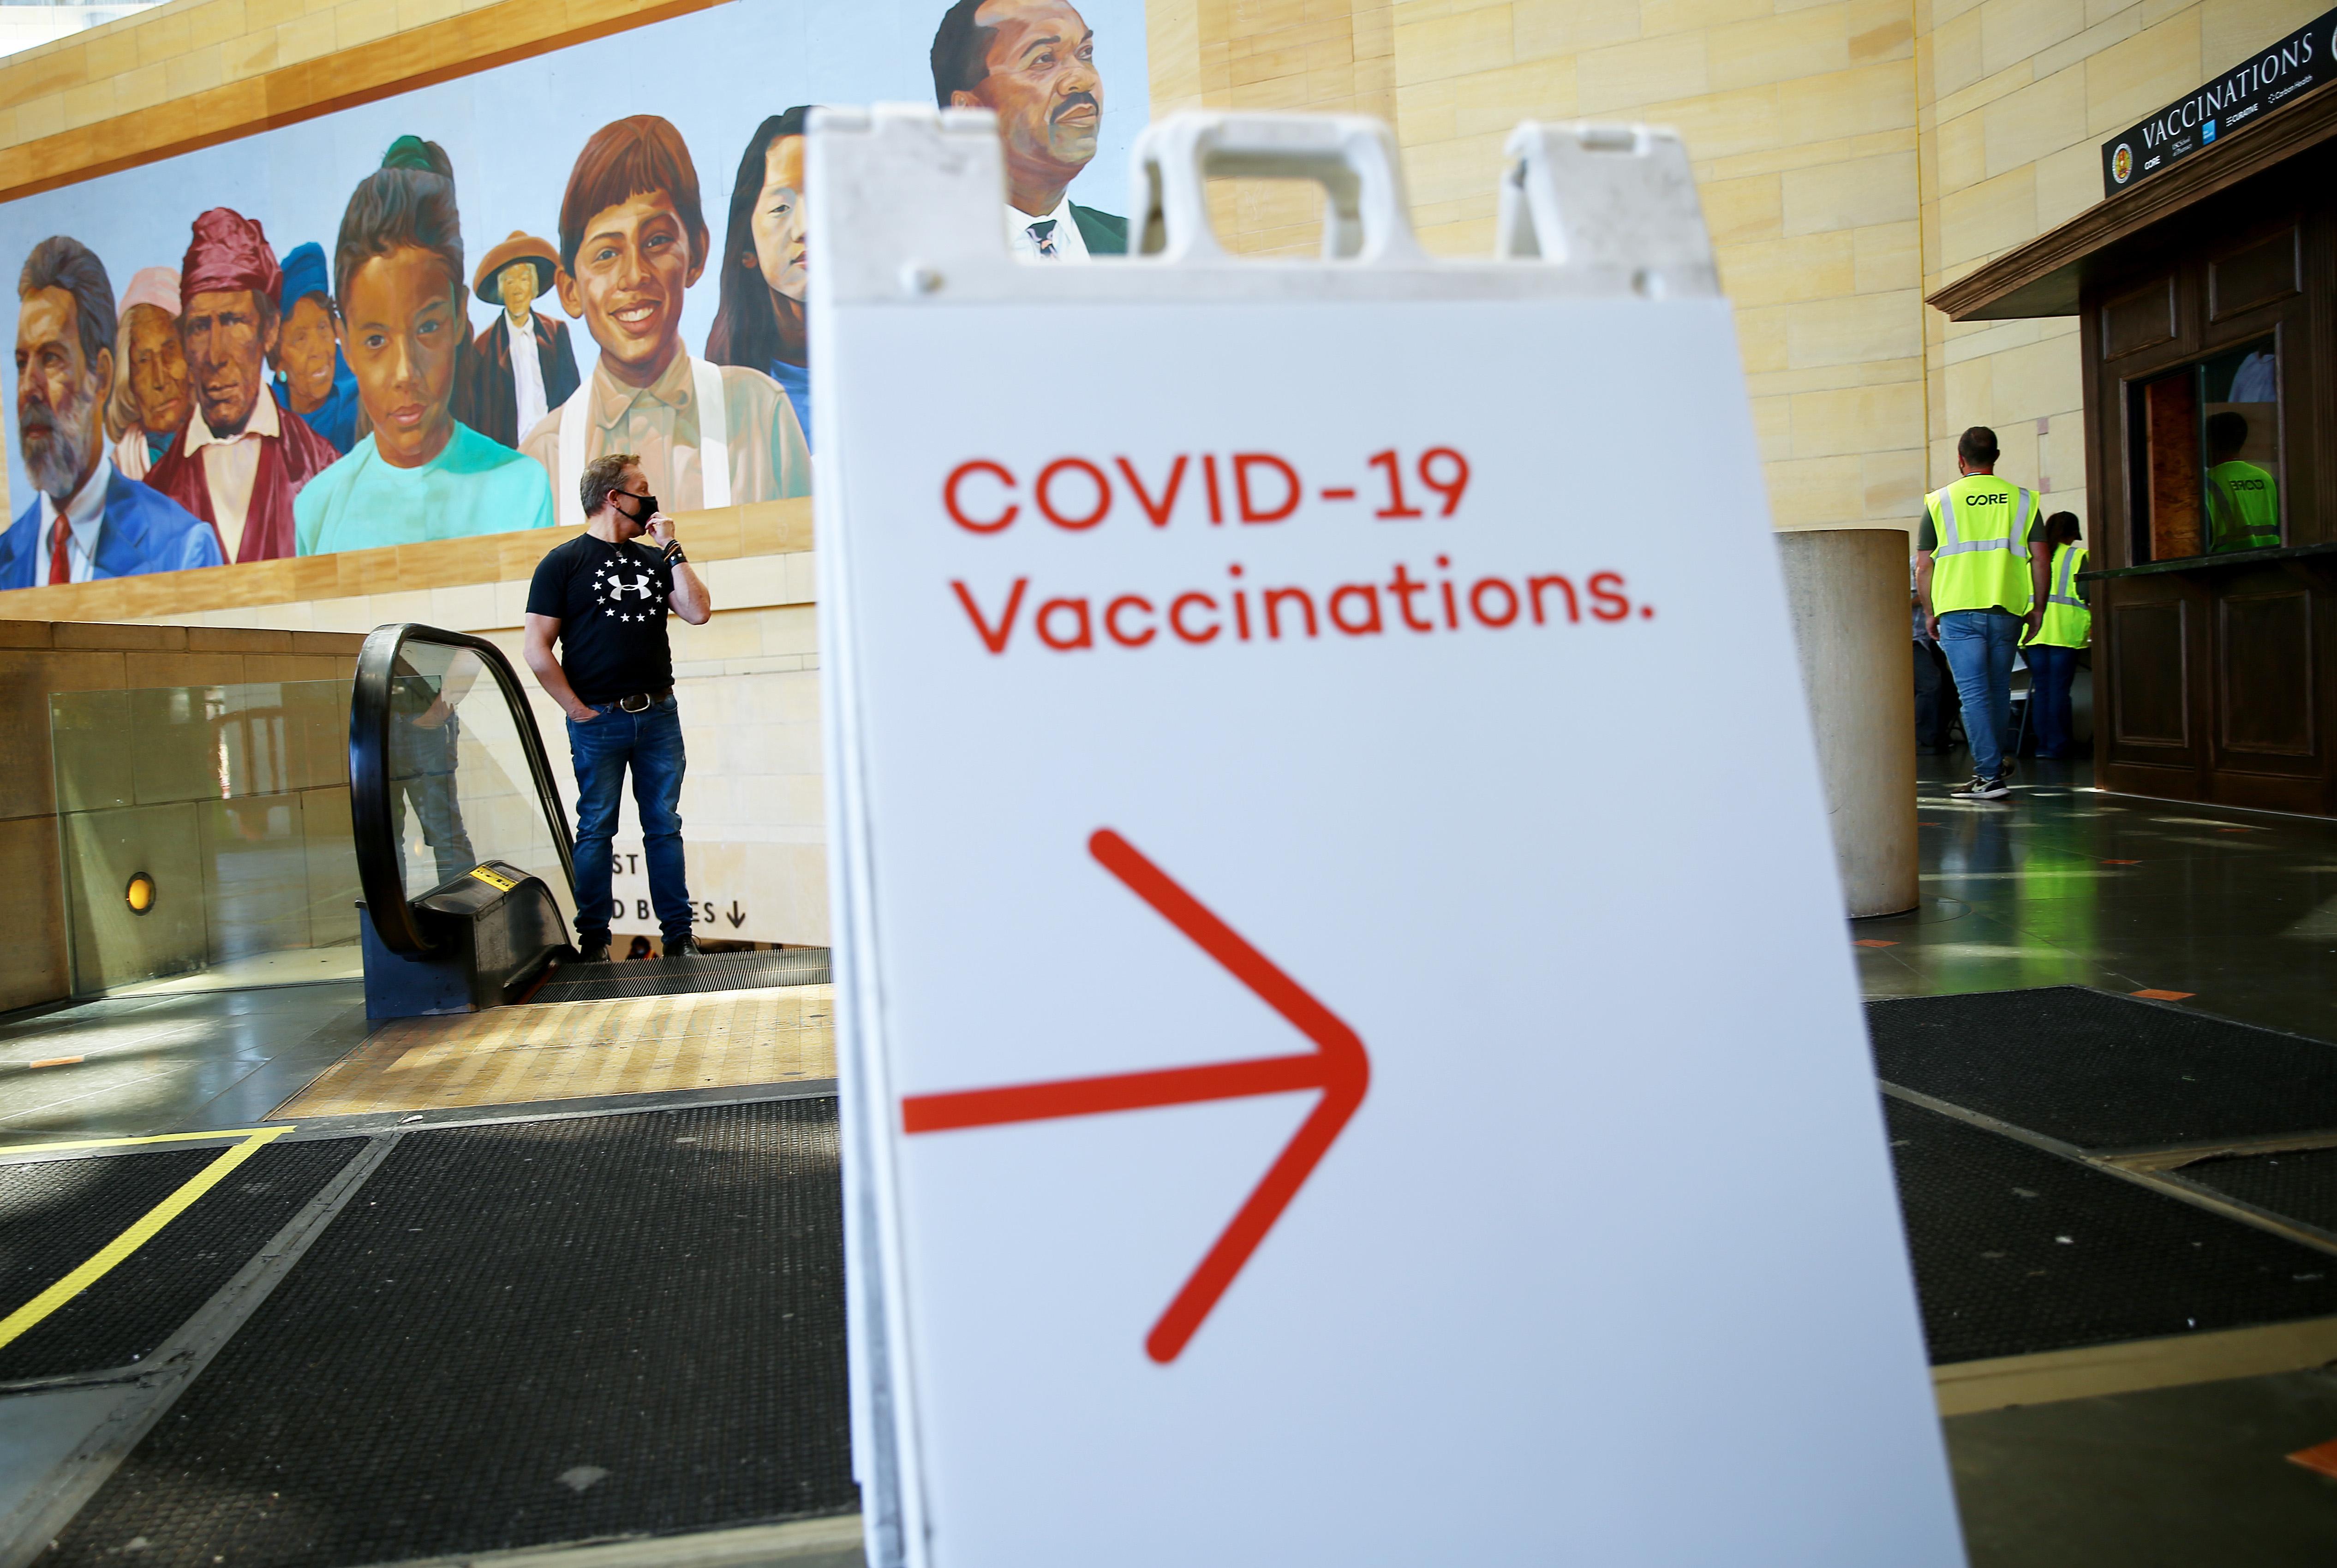 COVID-19 vaccination sign